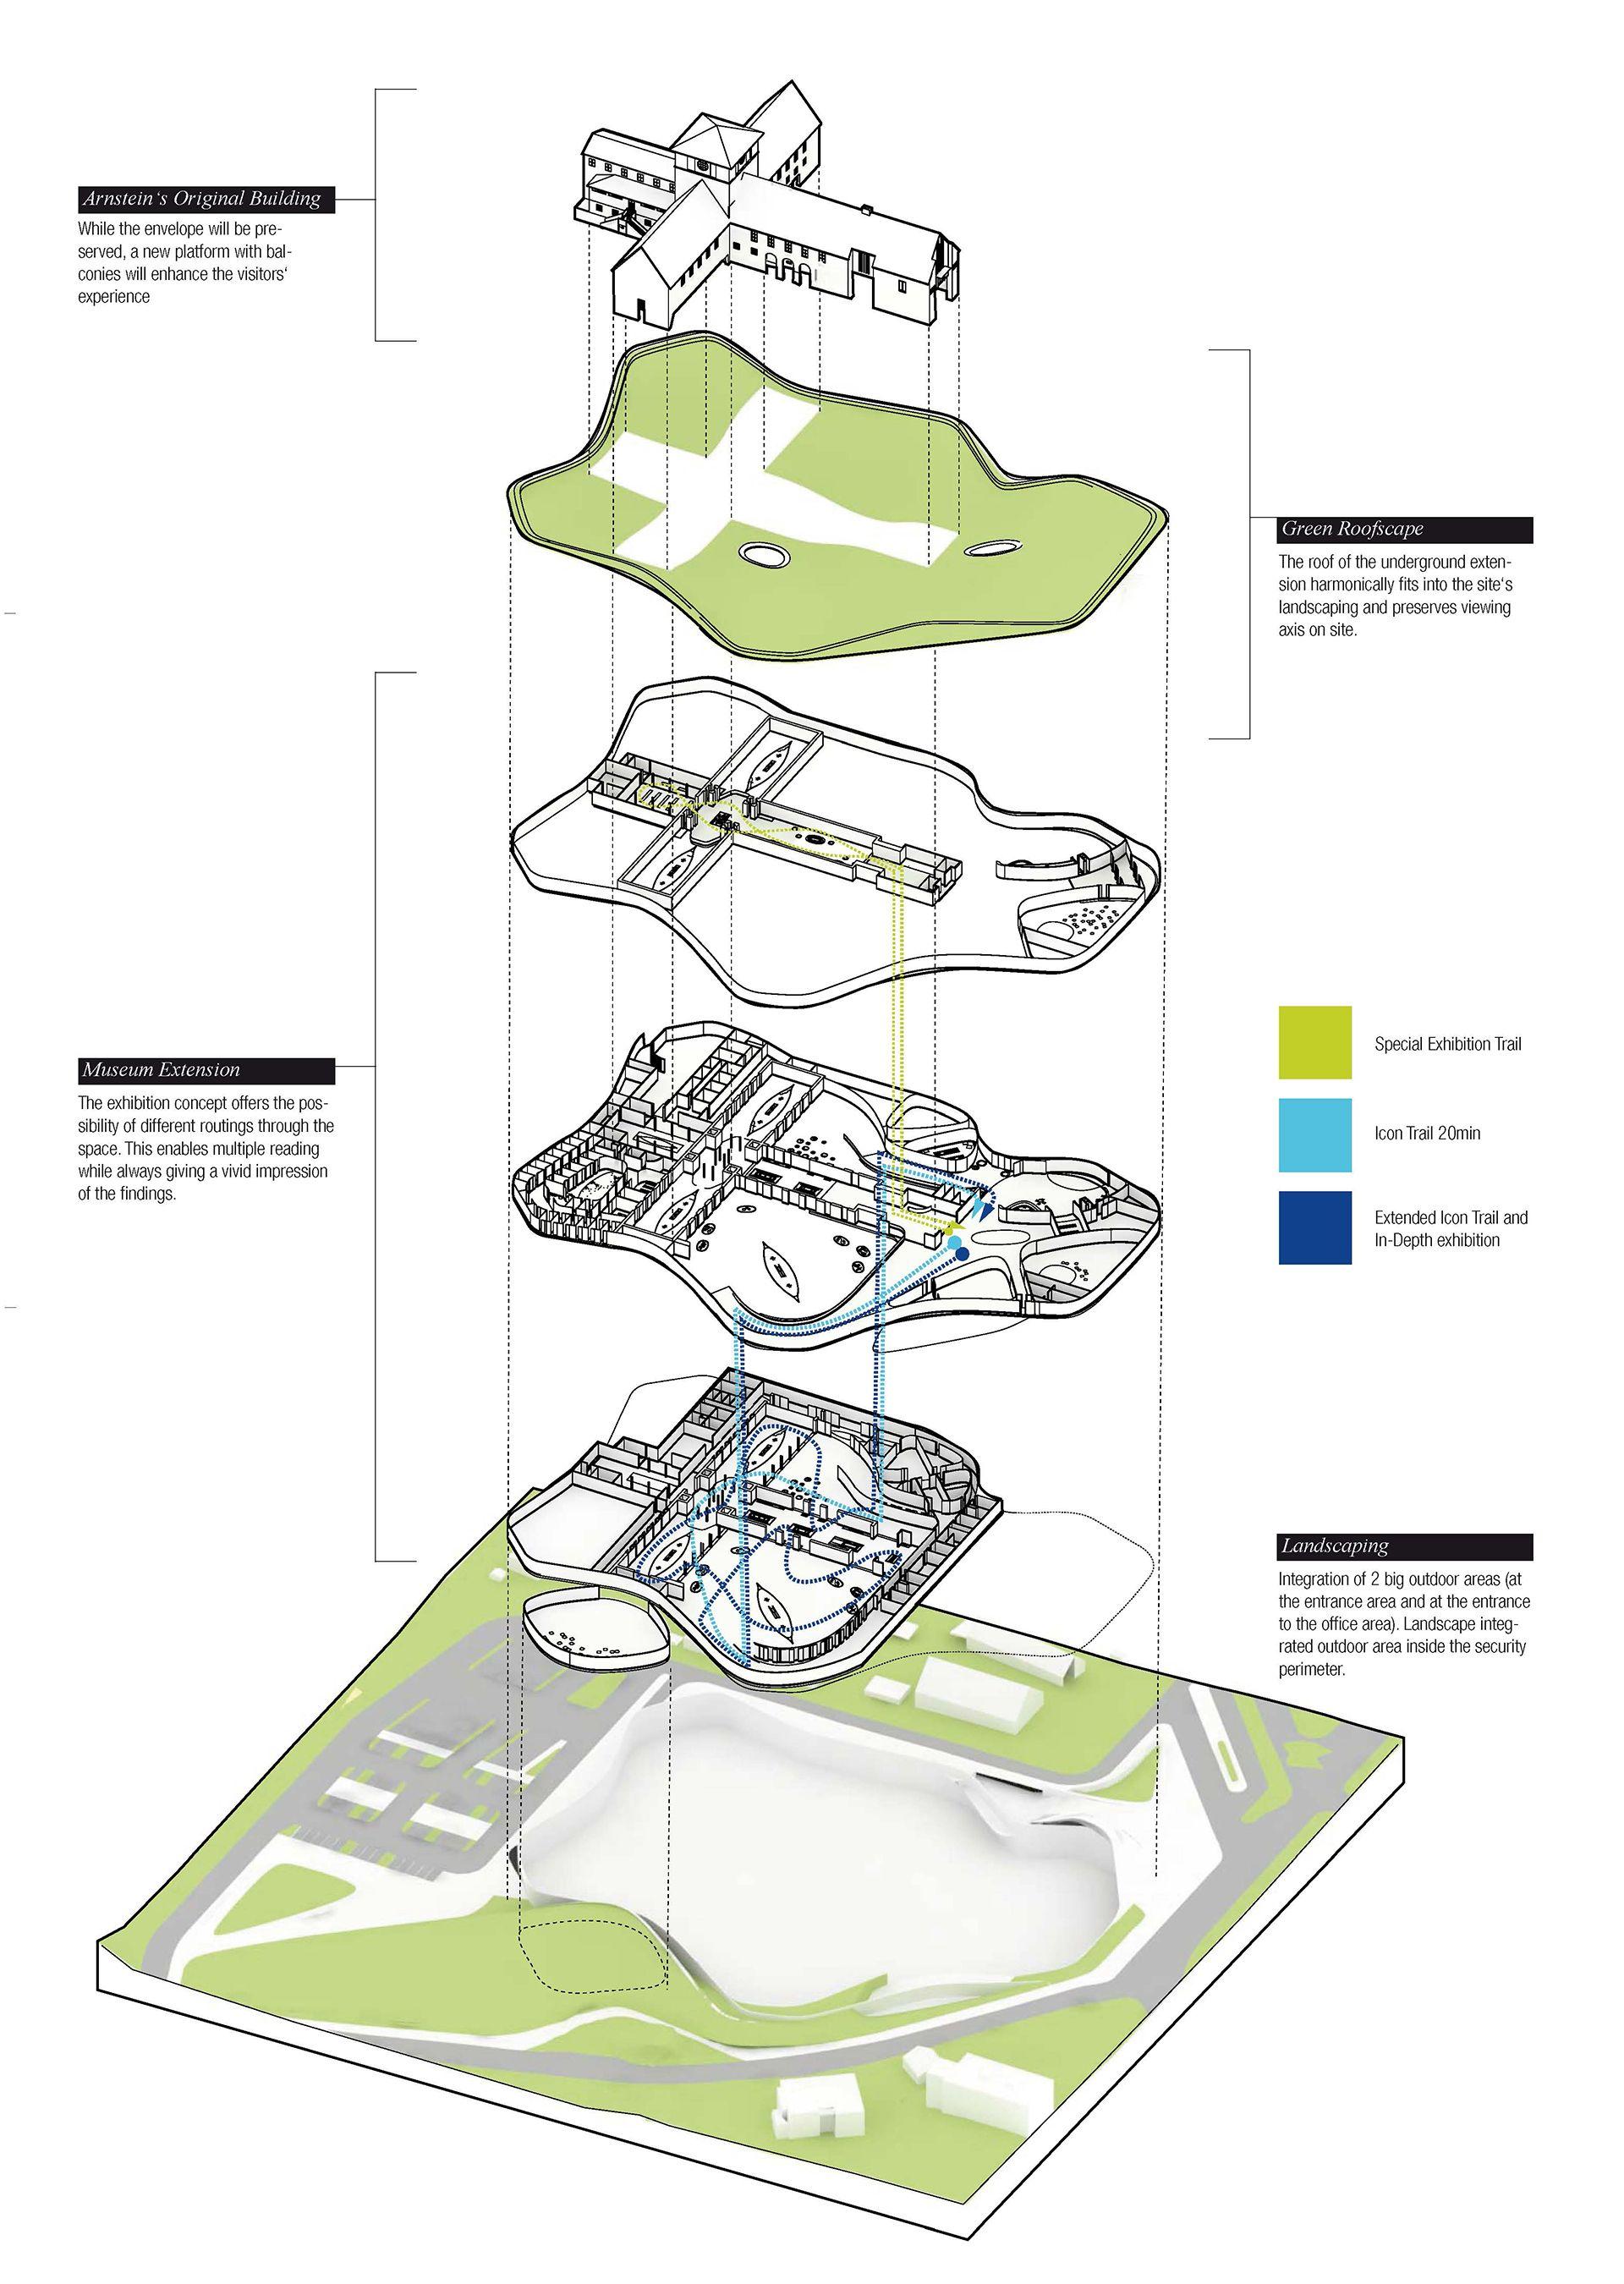 Viking Age Museum Concept